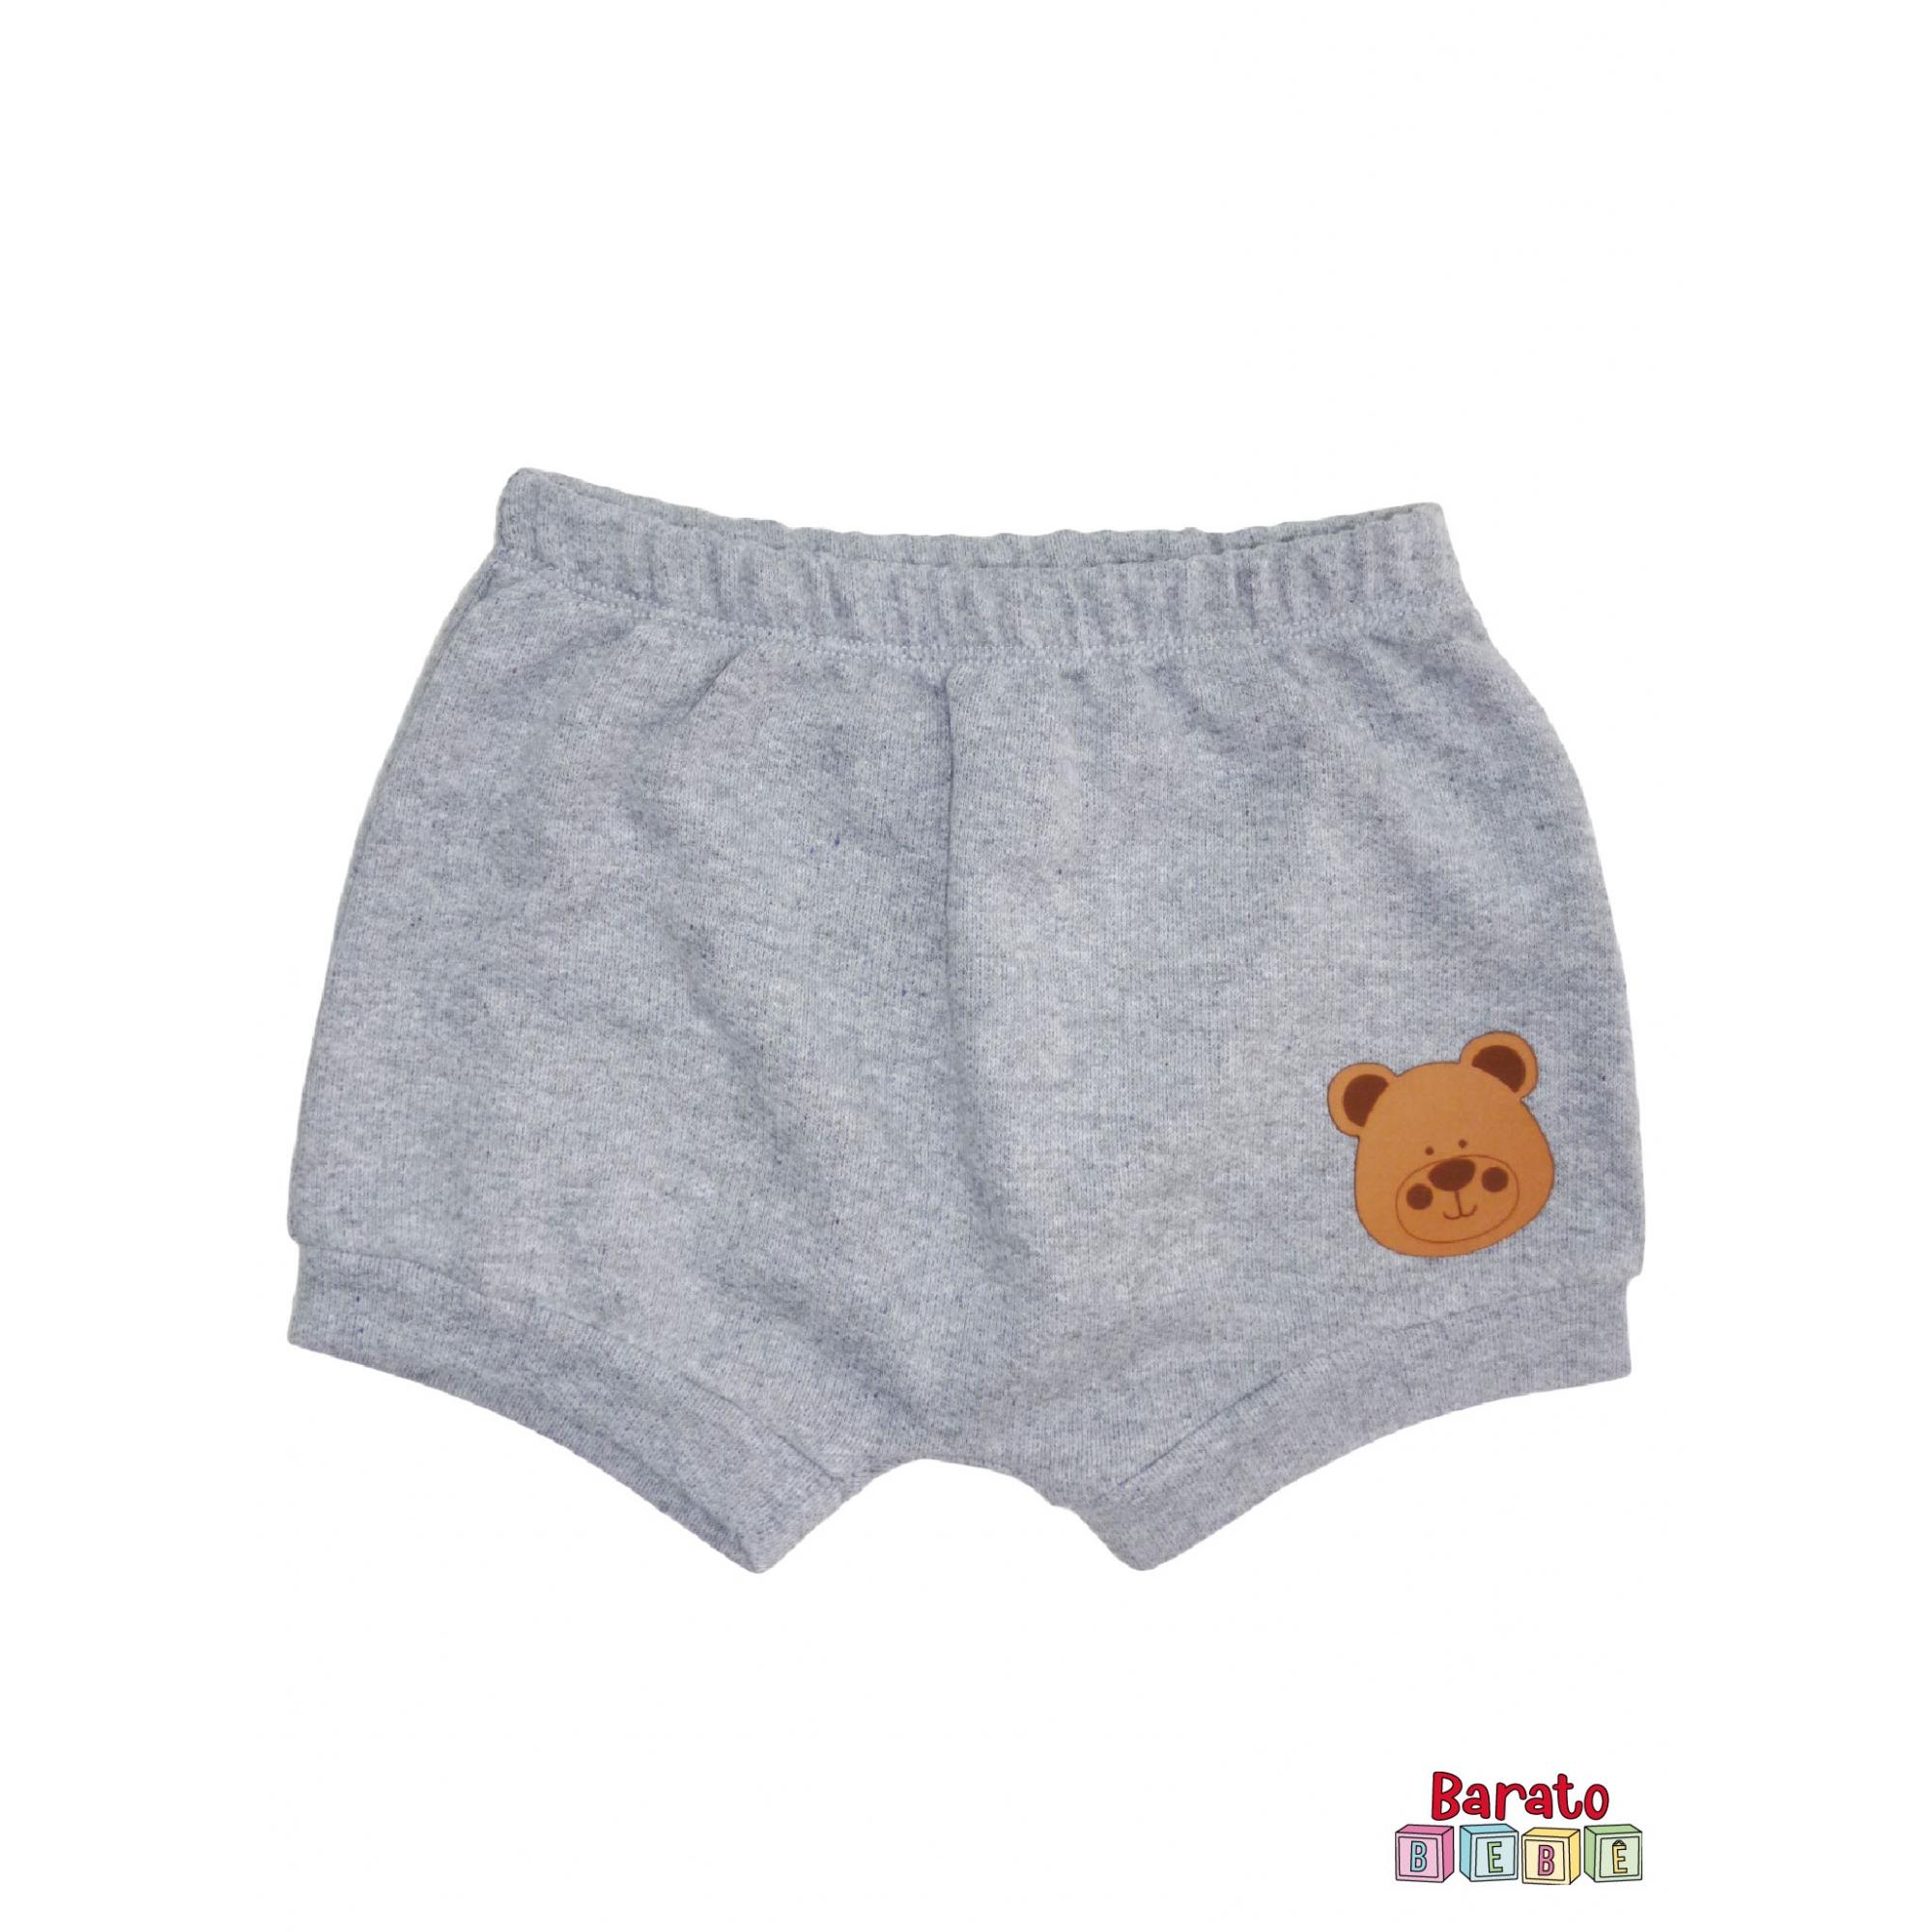 Shorts(Tapa Fralda) Bebê(P/M/G)  - Barato Bebê - Mescla C/ Aplique Ursinho